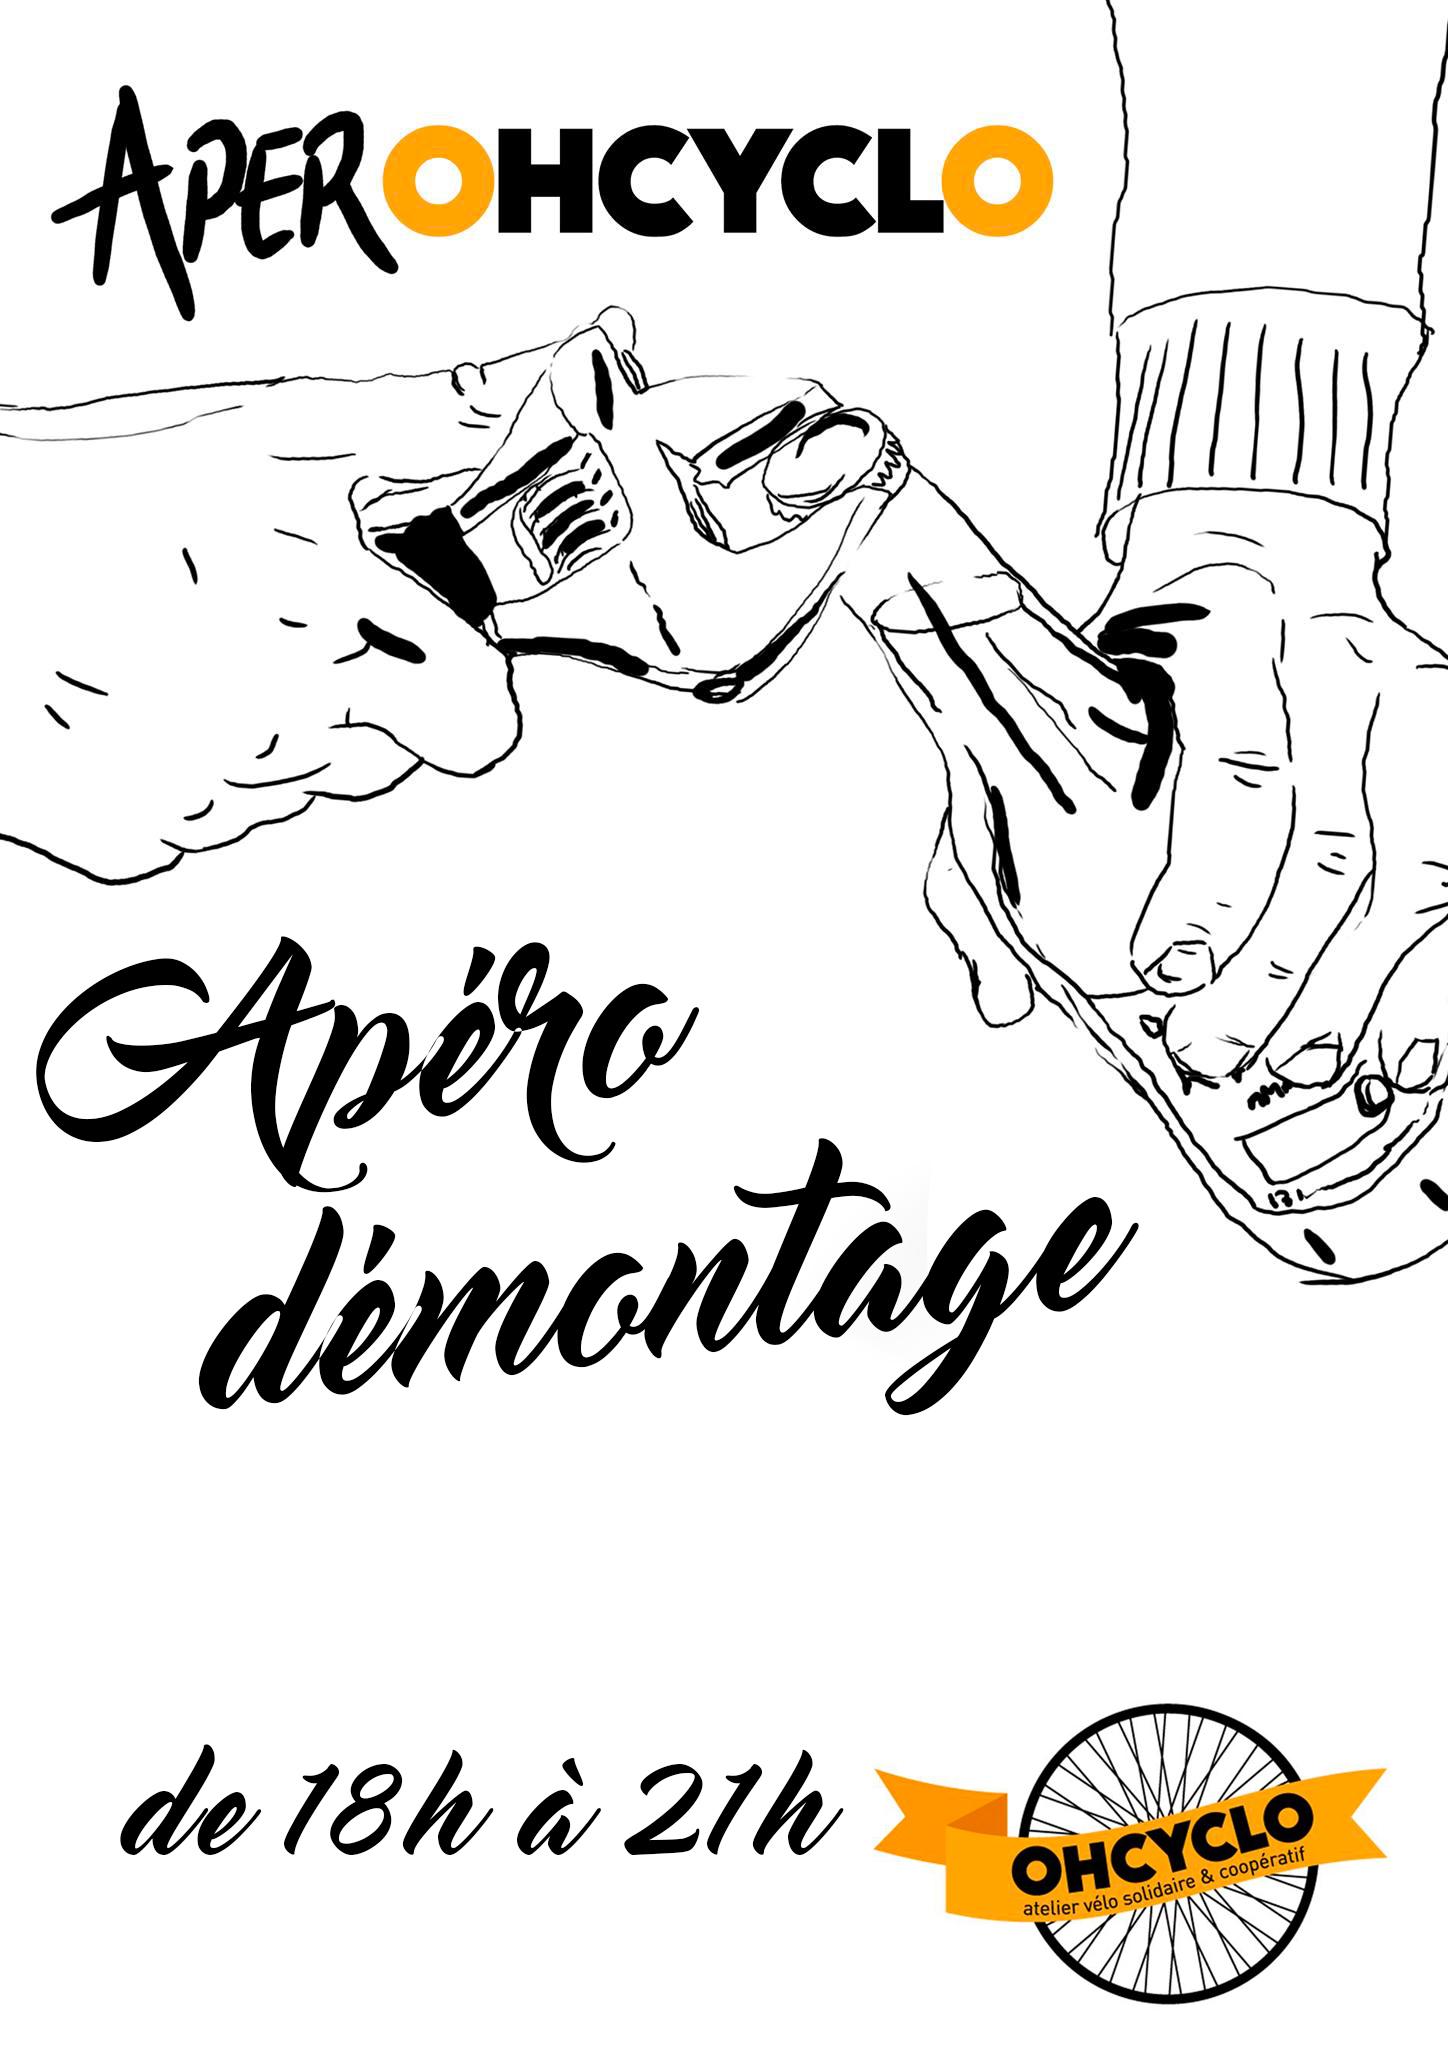 Soirée Démontage @ Atelier OHCYCLO